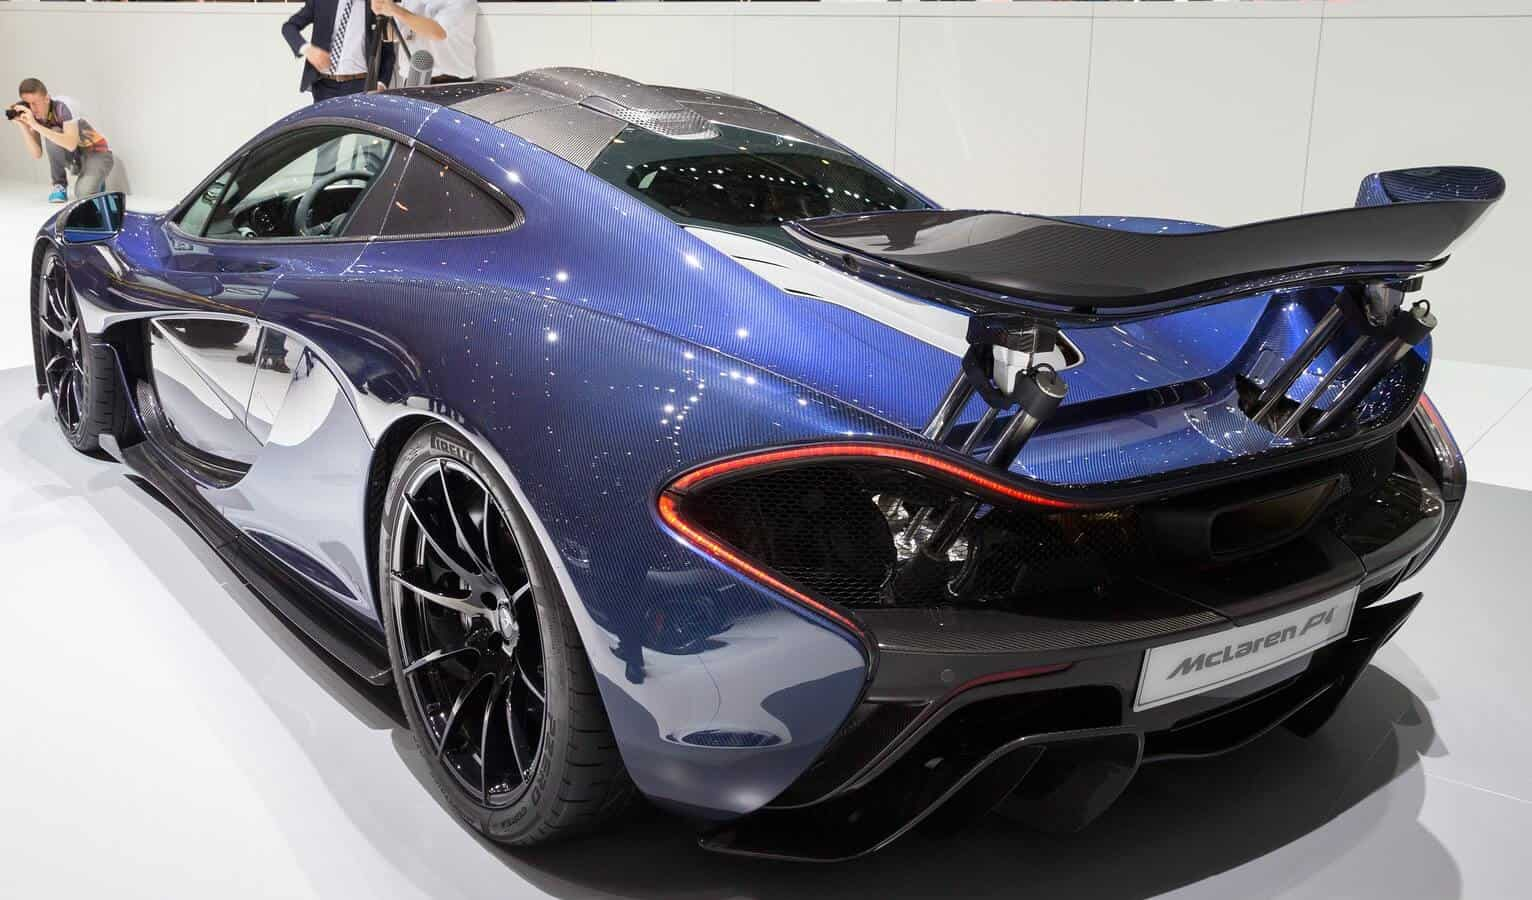 Blue McLaren at show